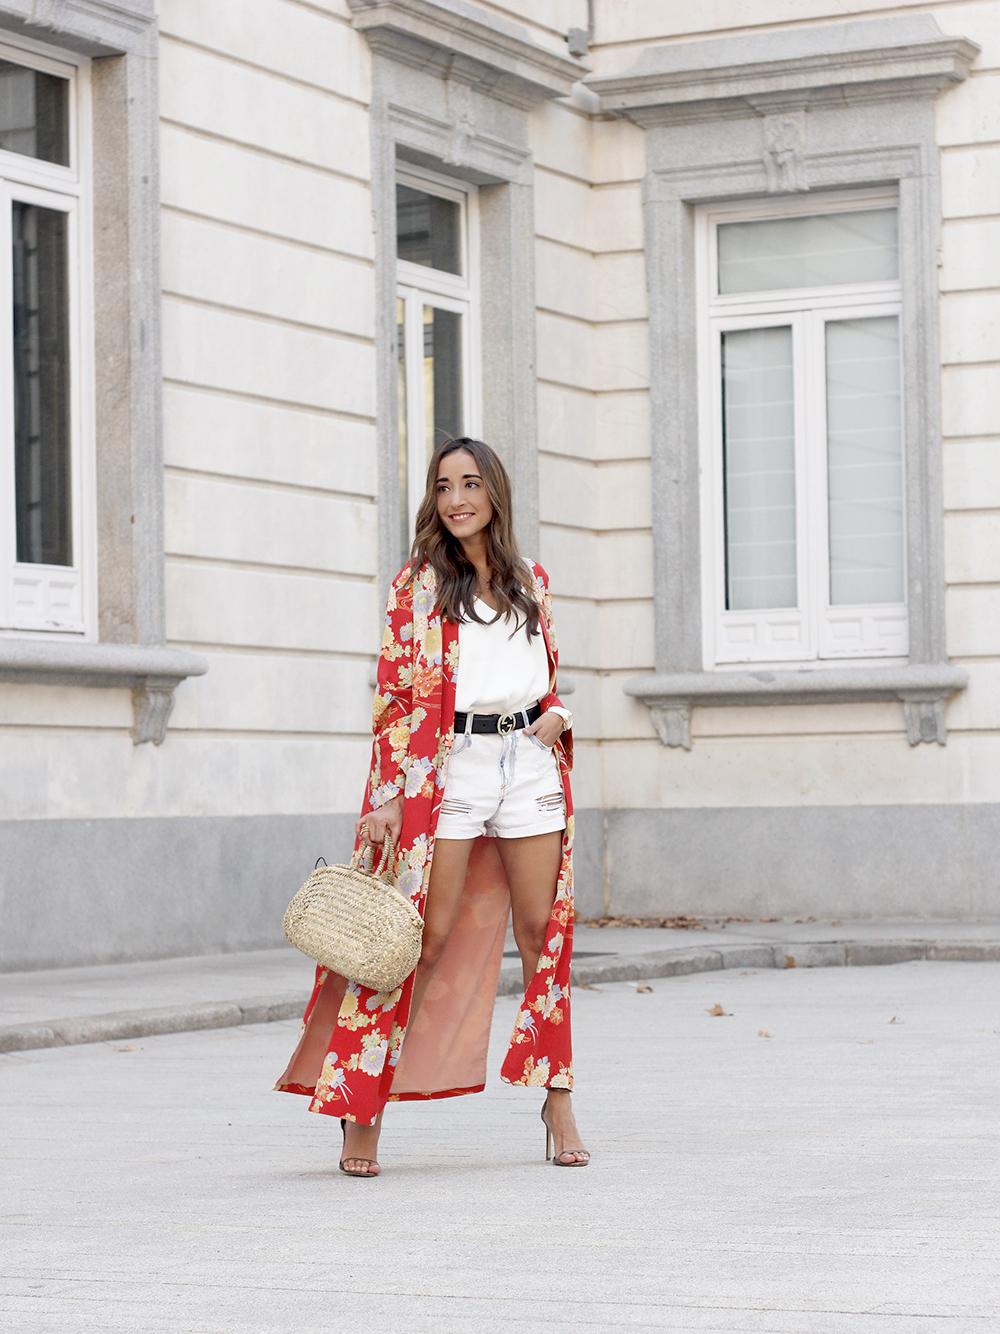 Flowered maxi kimono denim short heels summer girl style fashion04